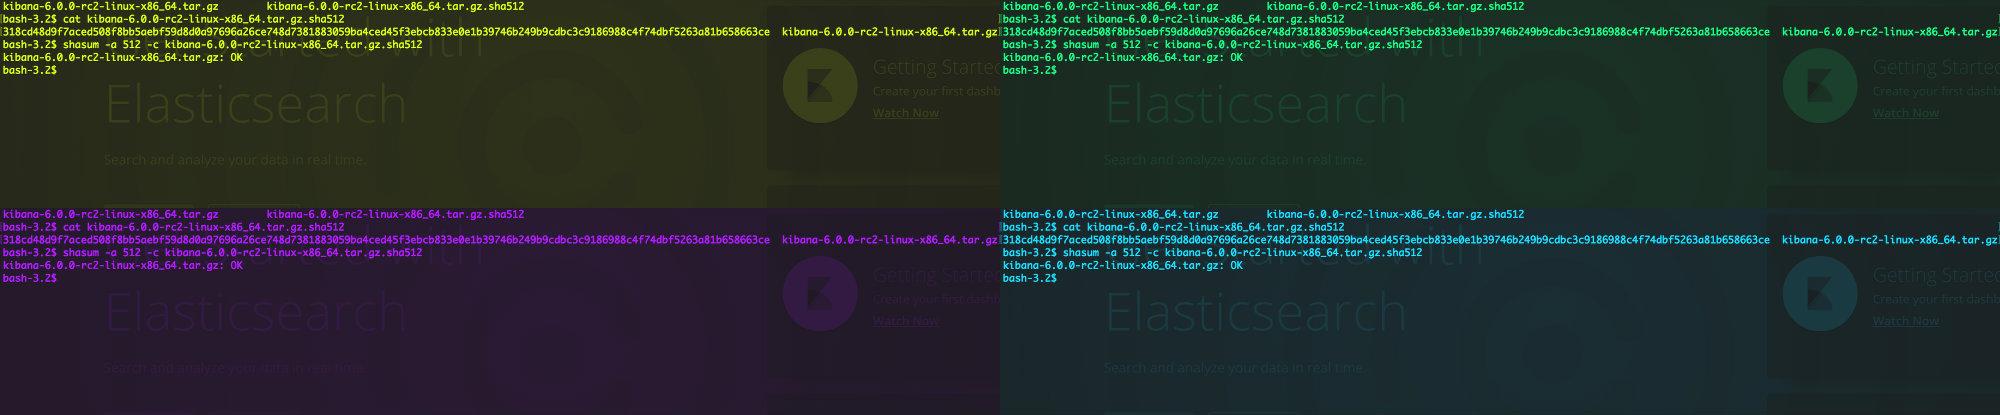 SHA-512 checksums for Elastic Stack artifacts | Elastic Blog